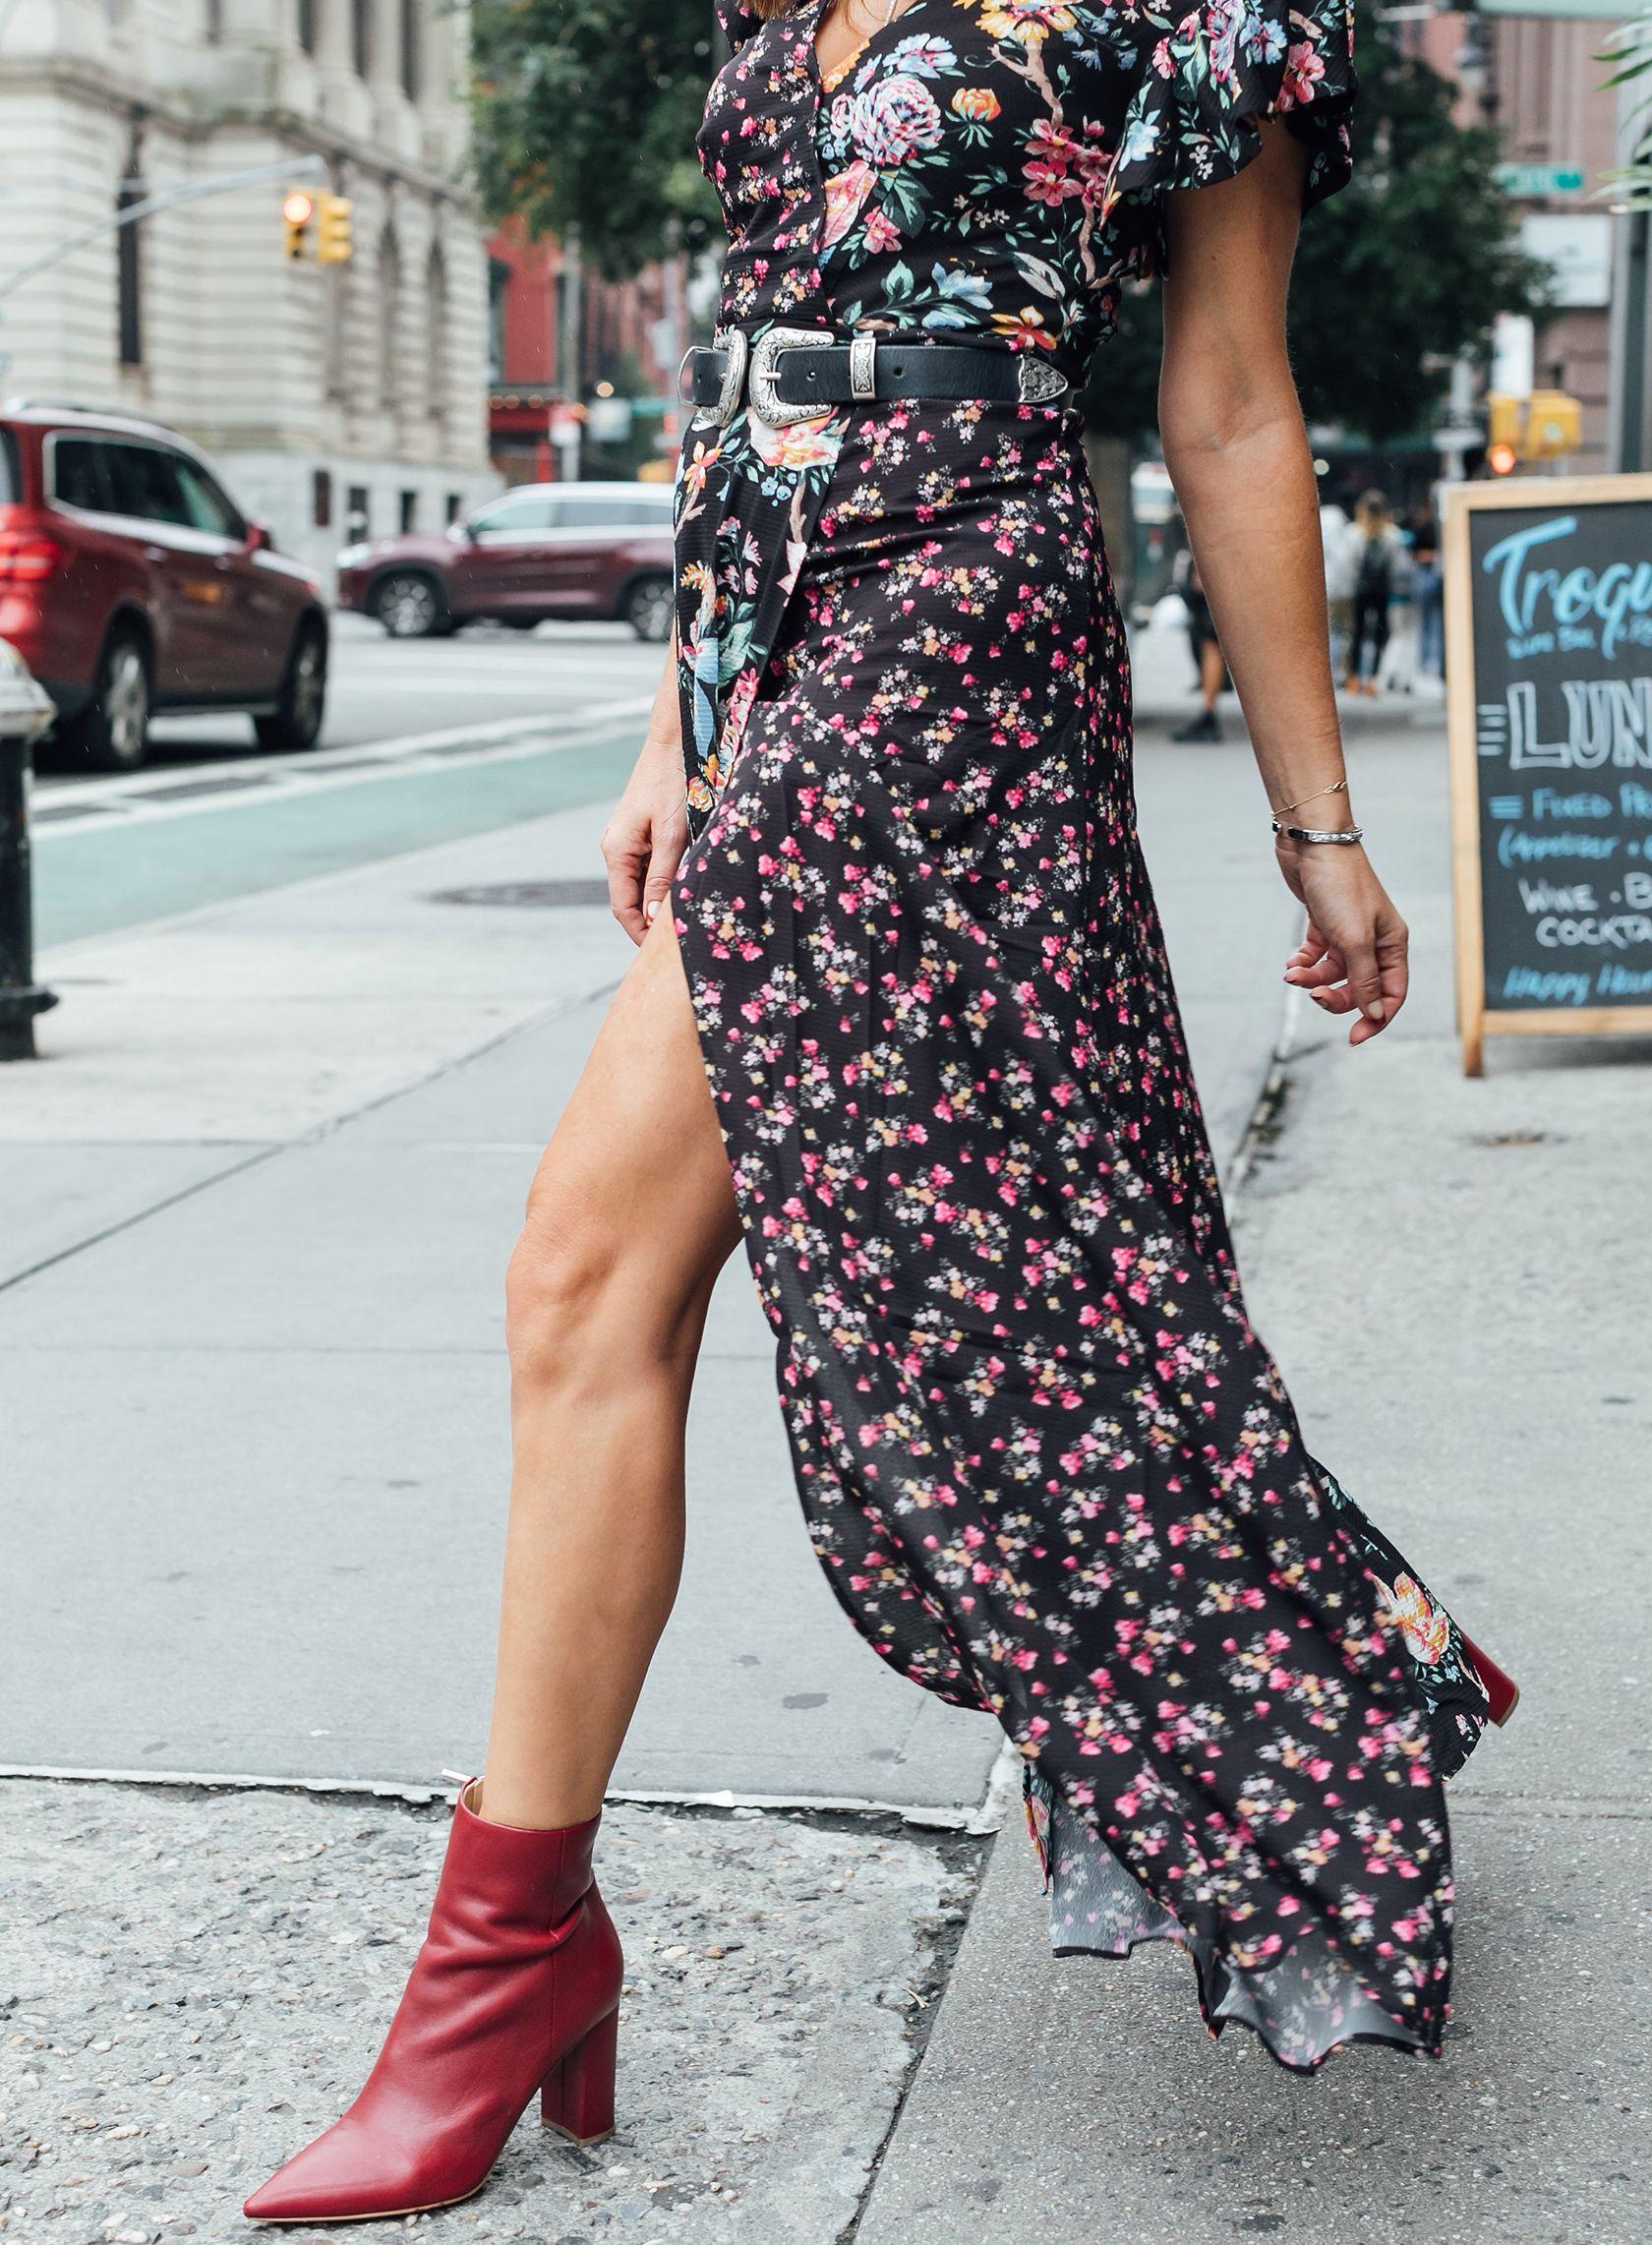 d5bcfe82422 Western Belts: My Favorite On-Trend Fall Accessory | Shoe Crush ...